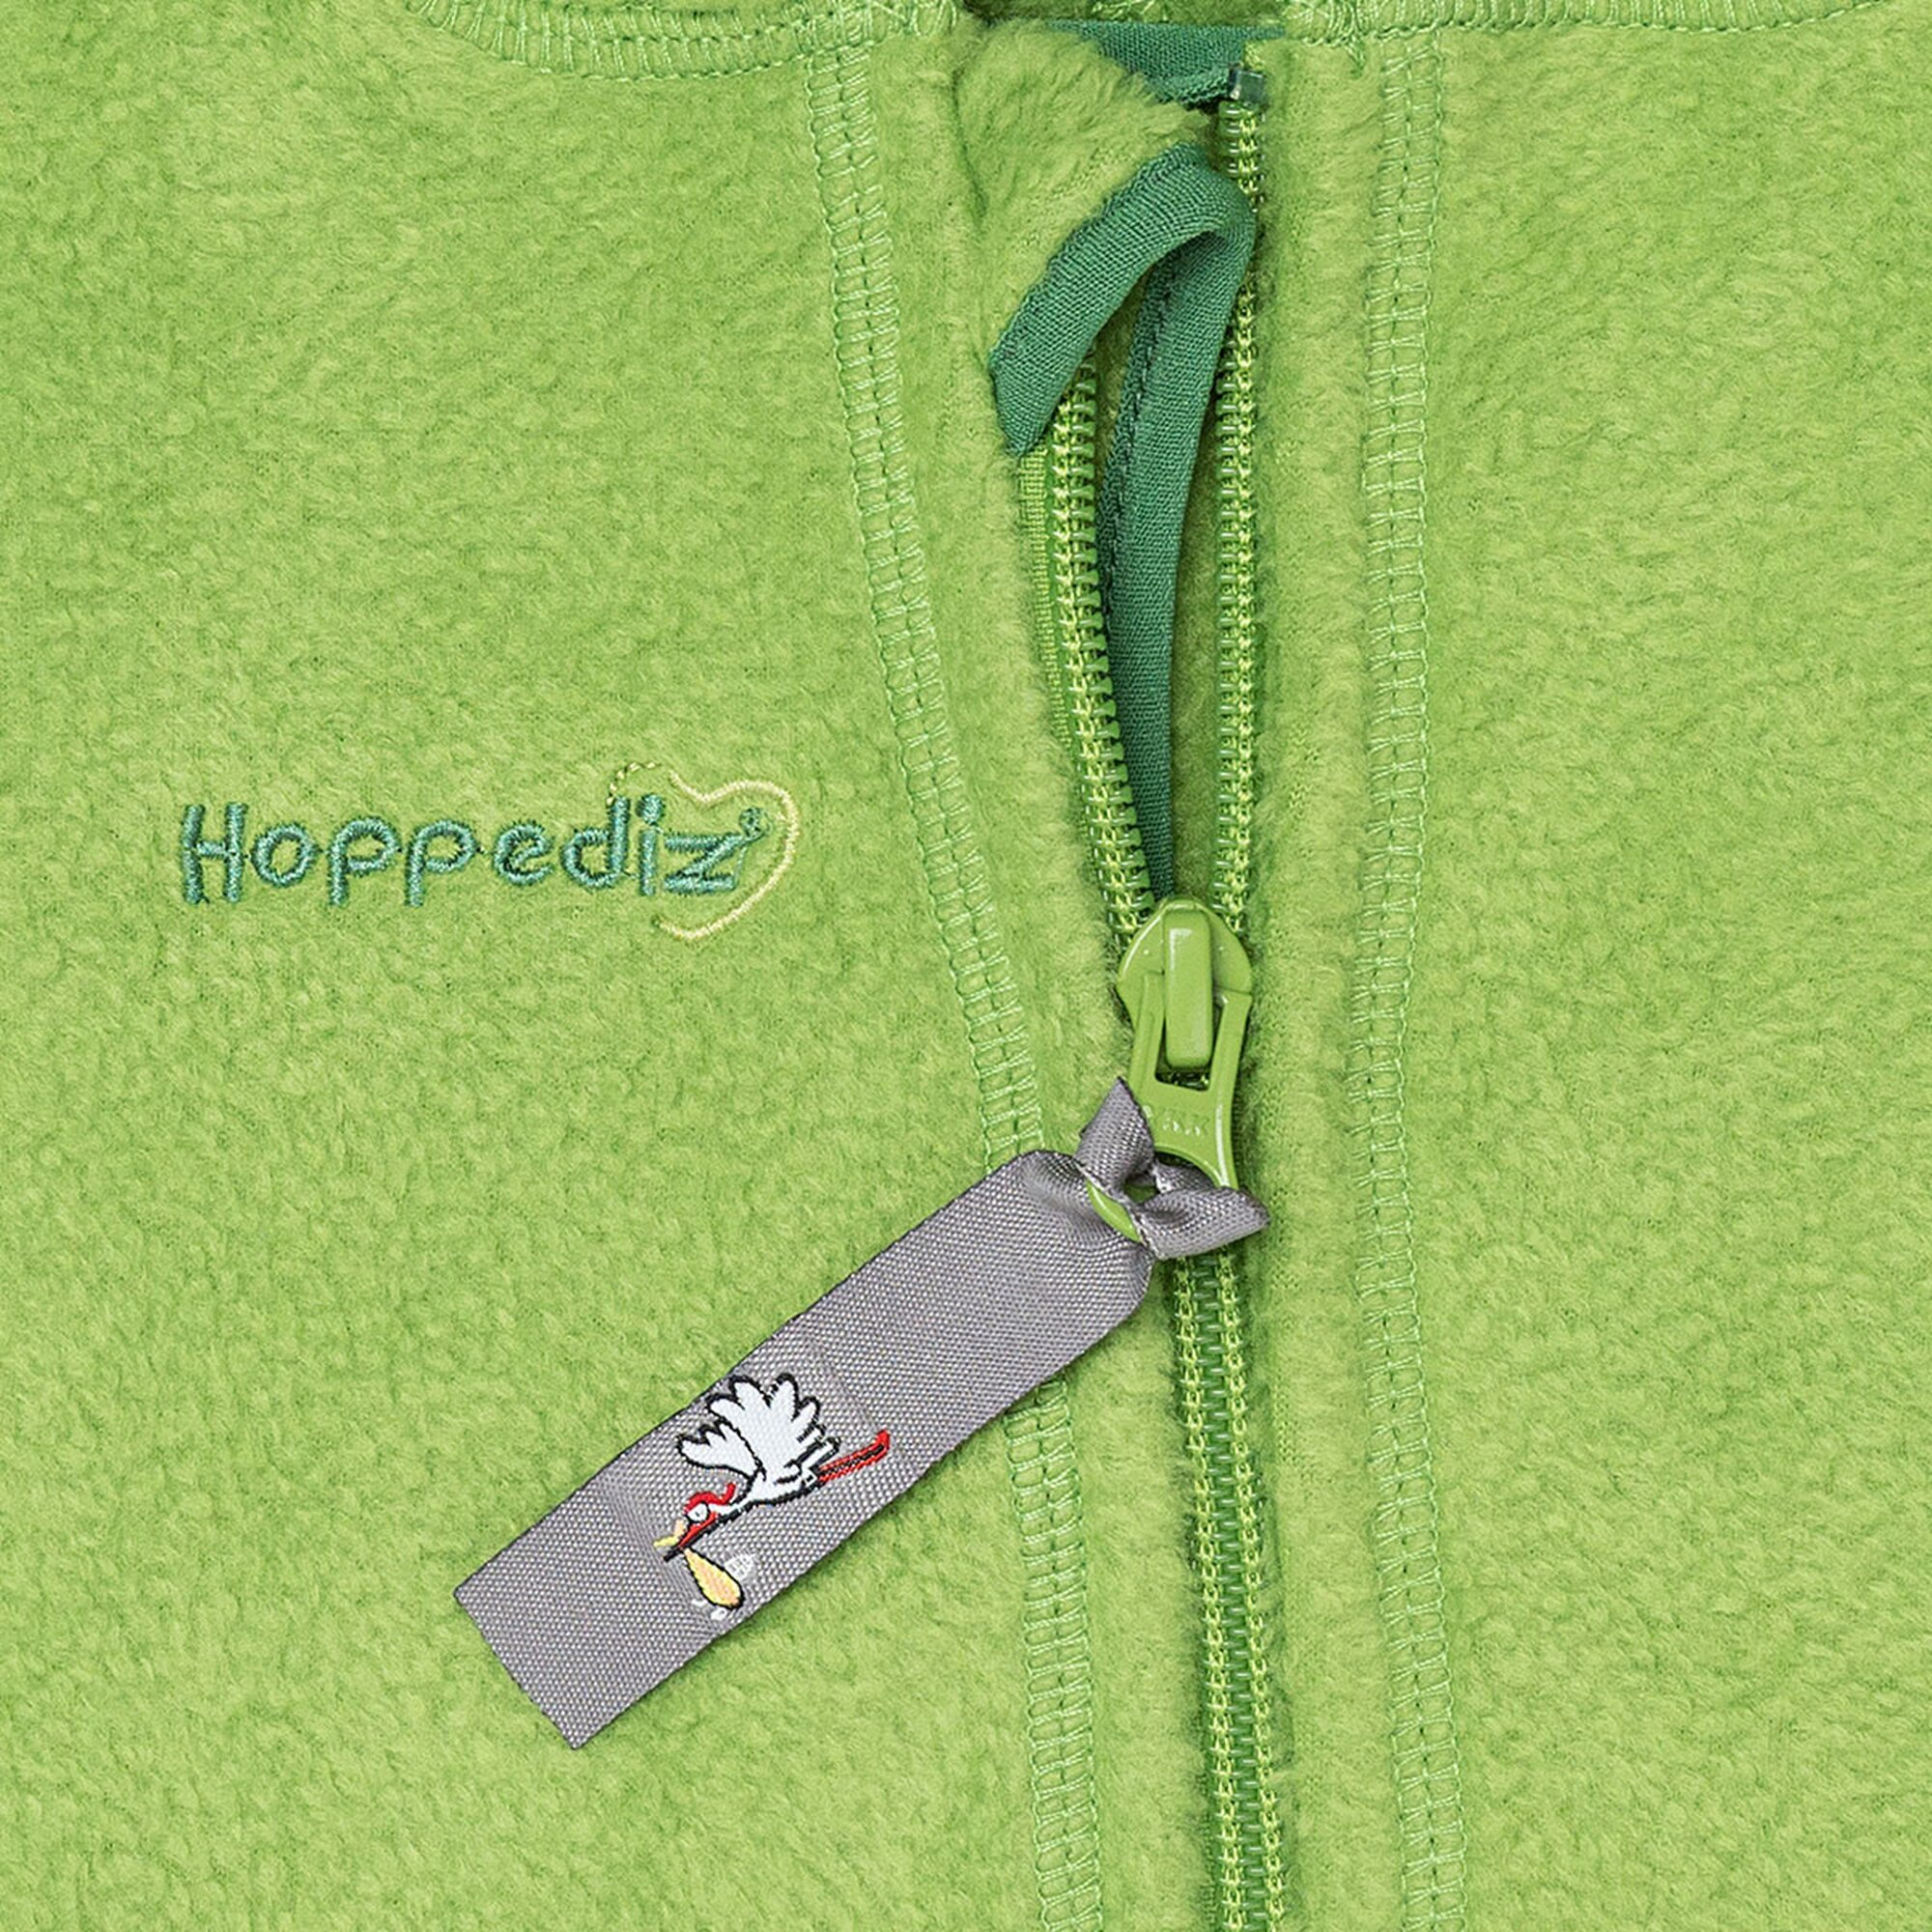 easymaxx-fleece-trage-overalls